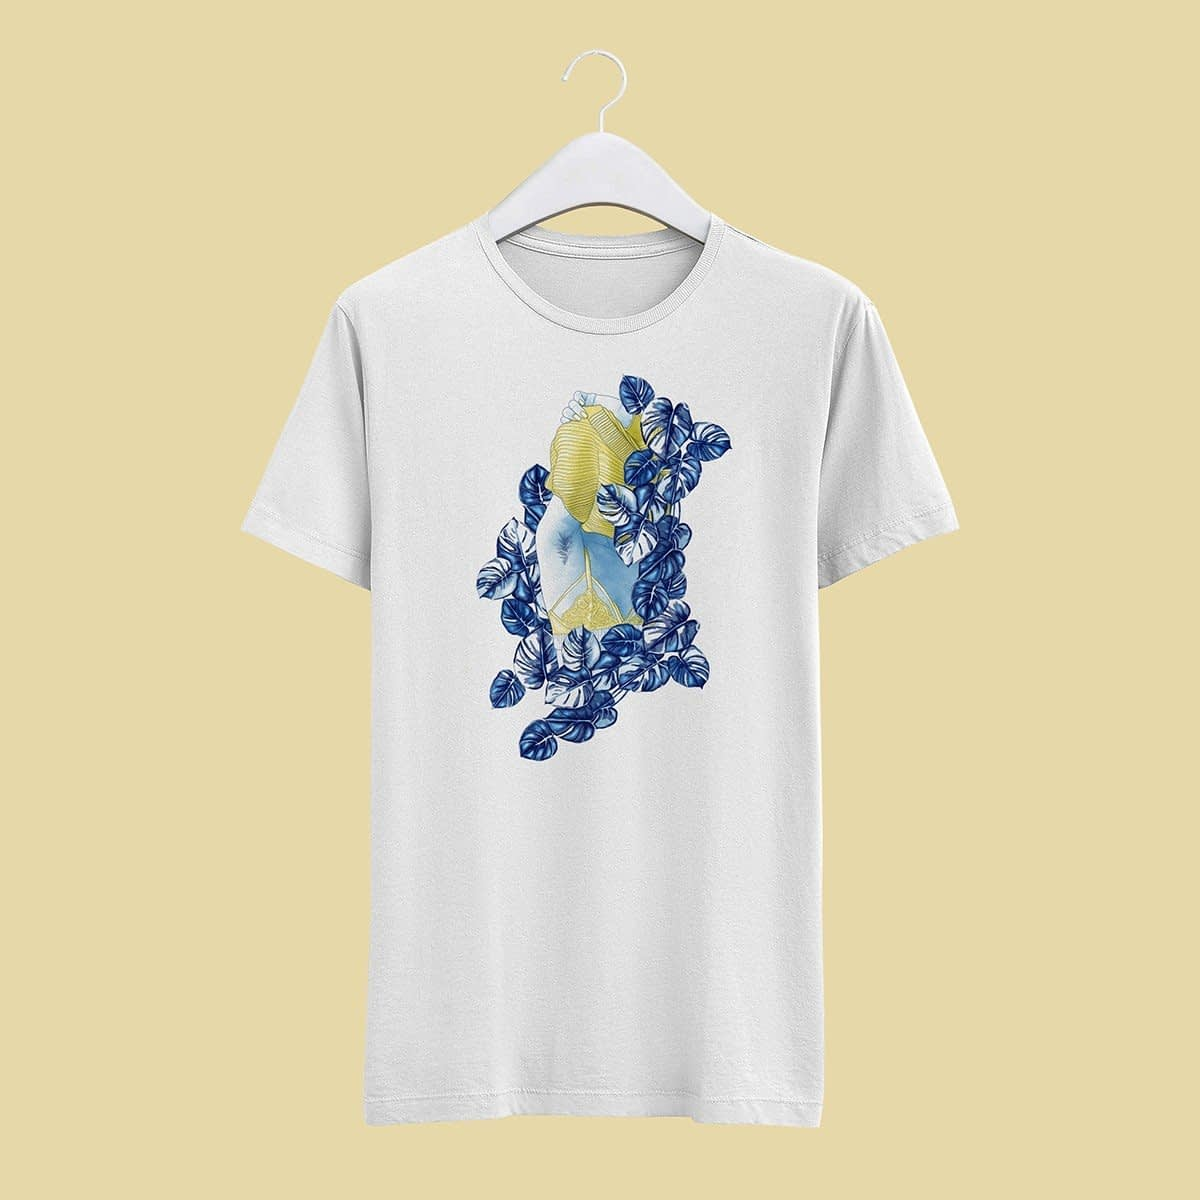 FUORIMODA | t-shirt